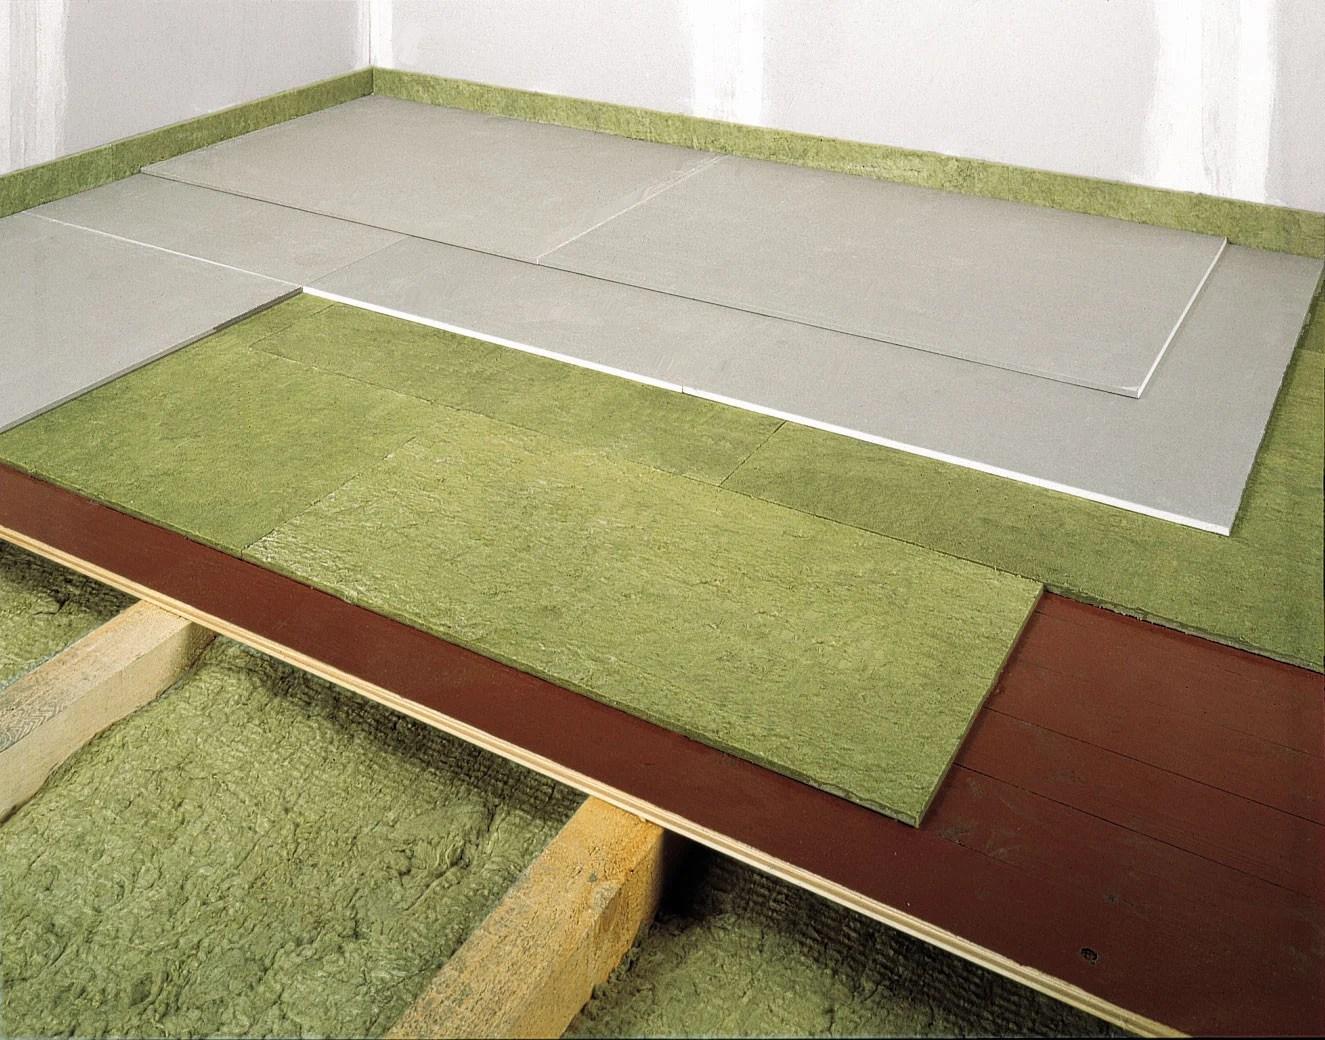 schalld mmung decke altbau xps d mmplatte jackodur kf700 standard sf 120 mm. Black Bedroom Furniture Sets. Home Design Ideas